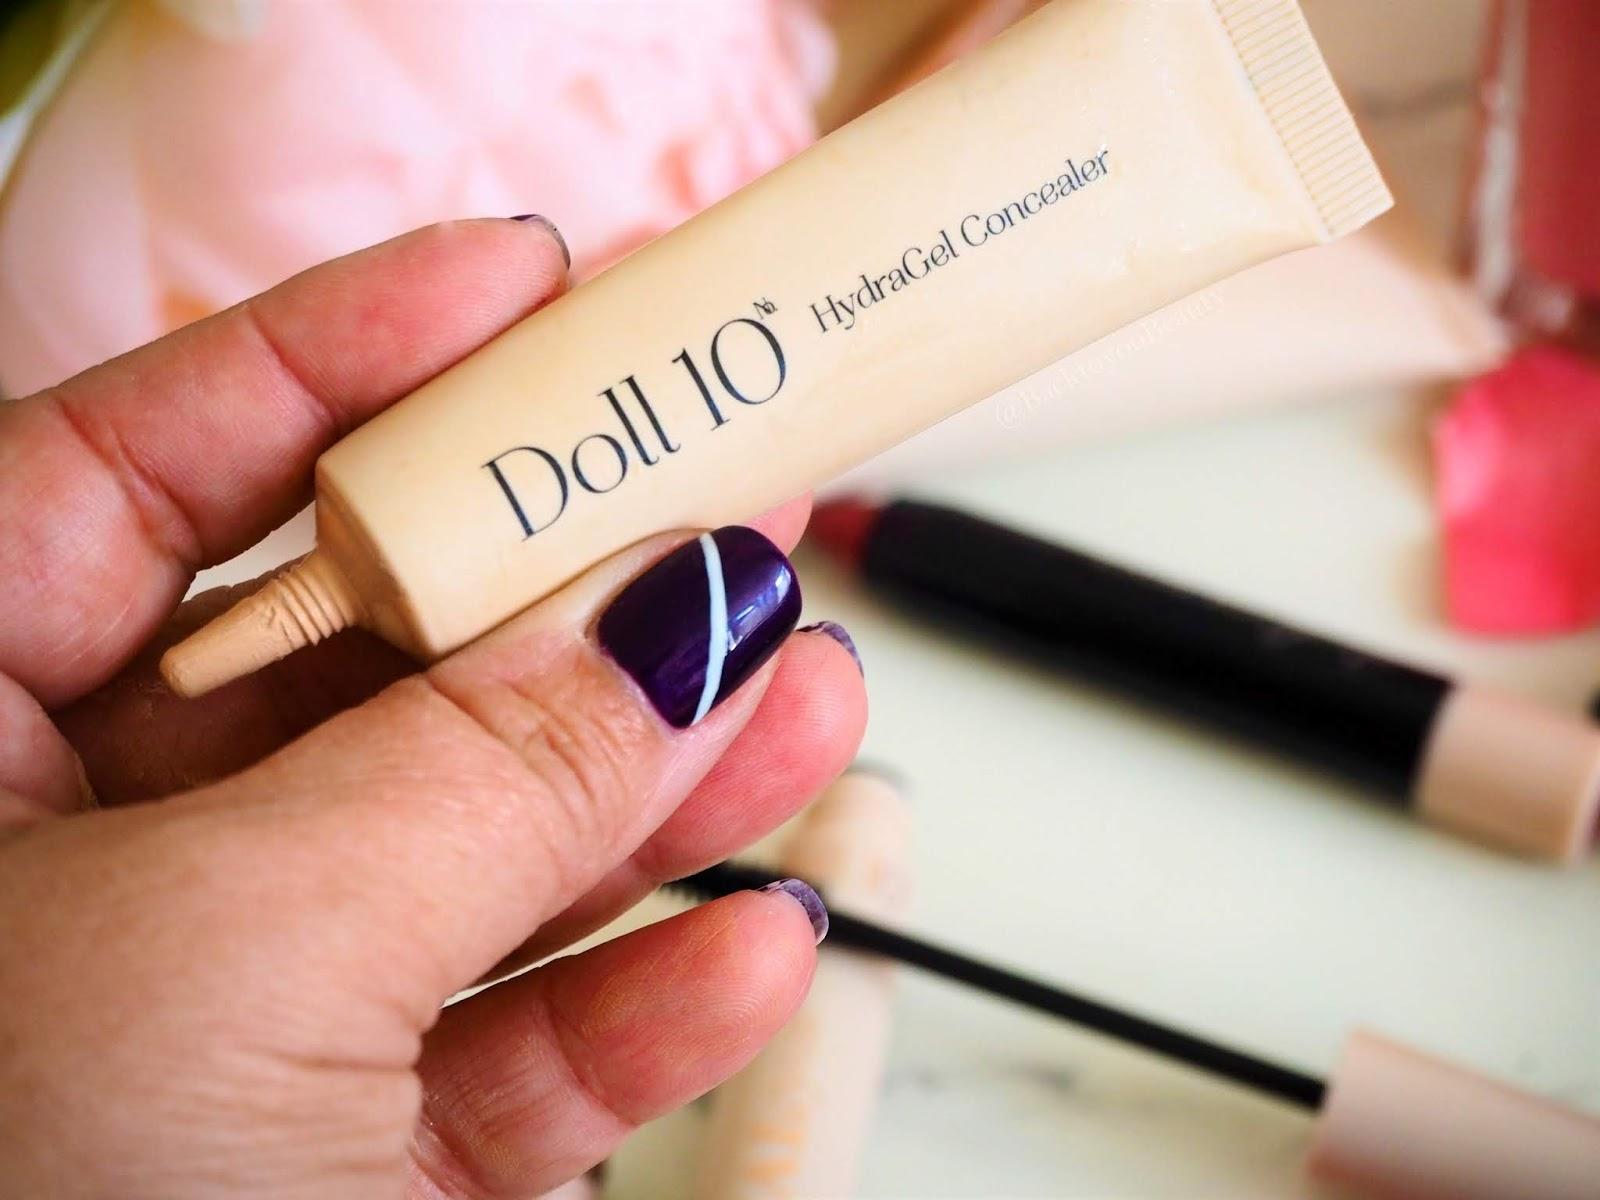 Doll 10 Hydragel Concealer